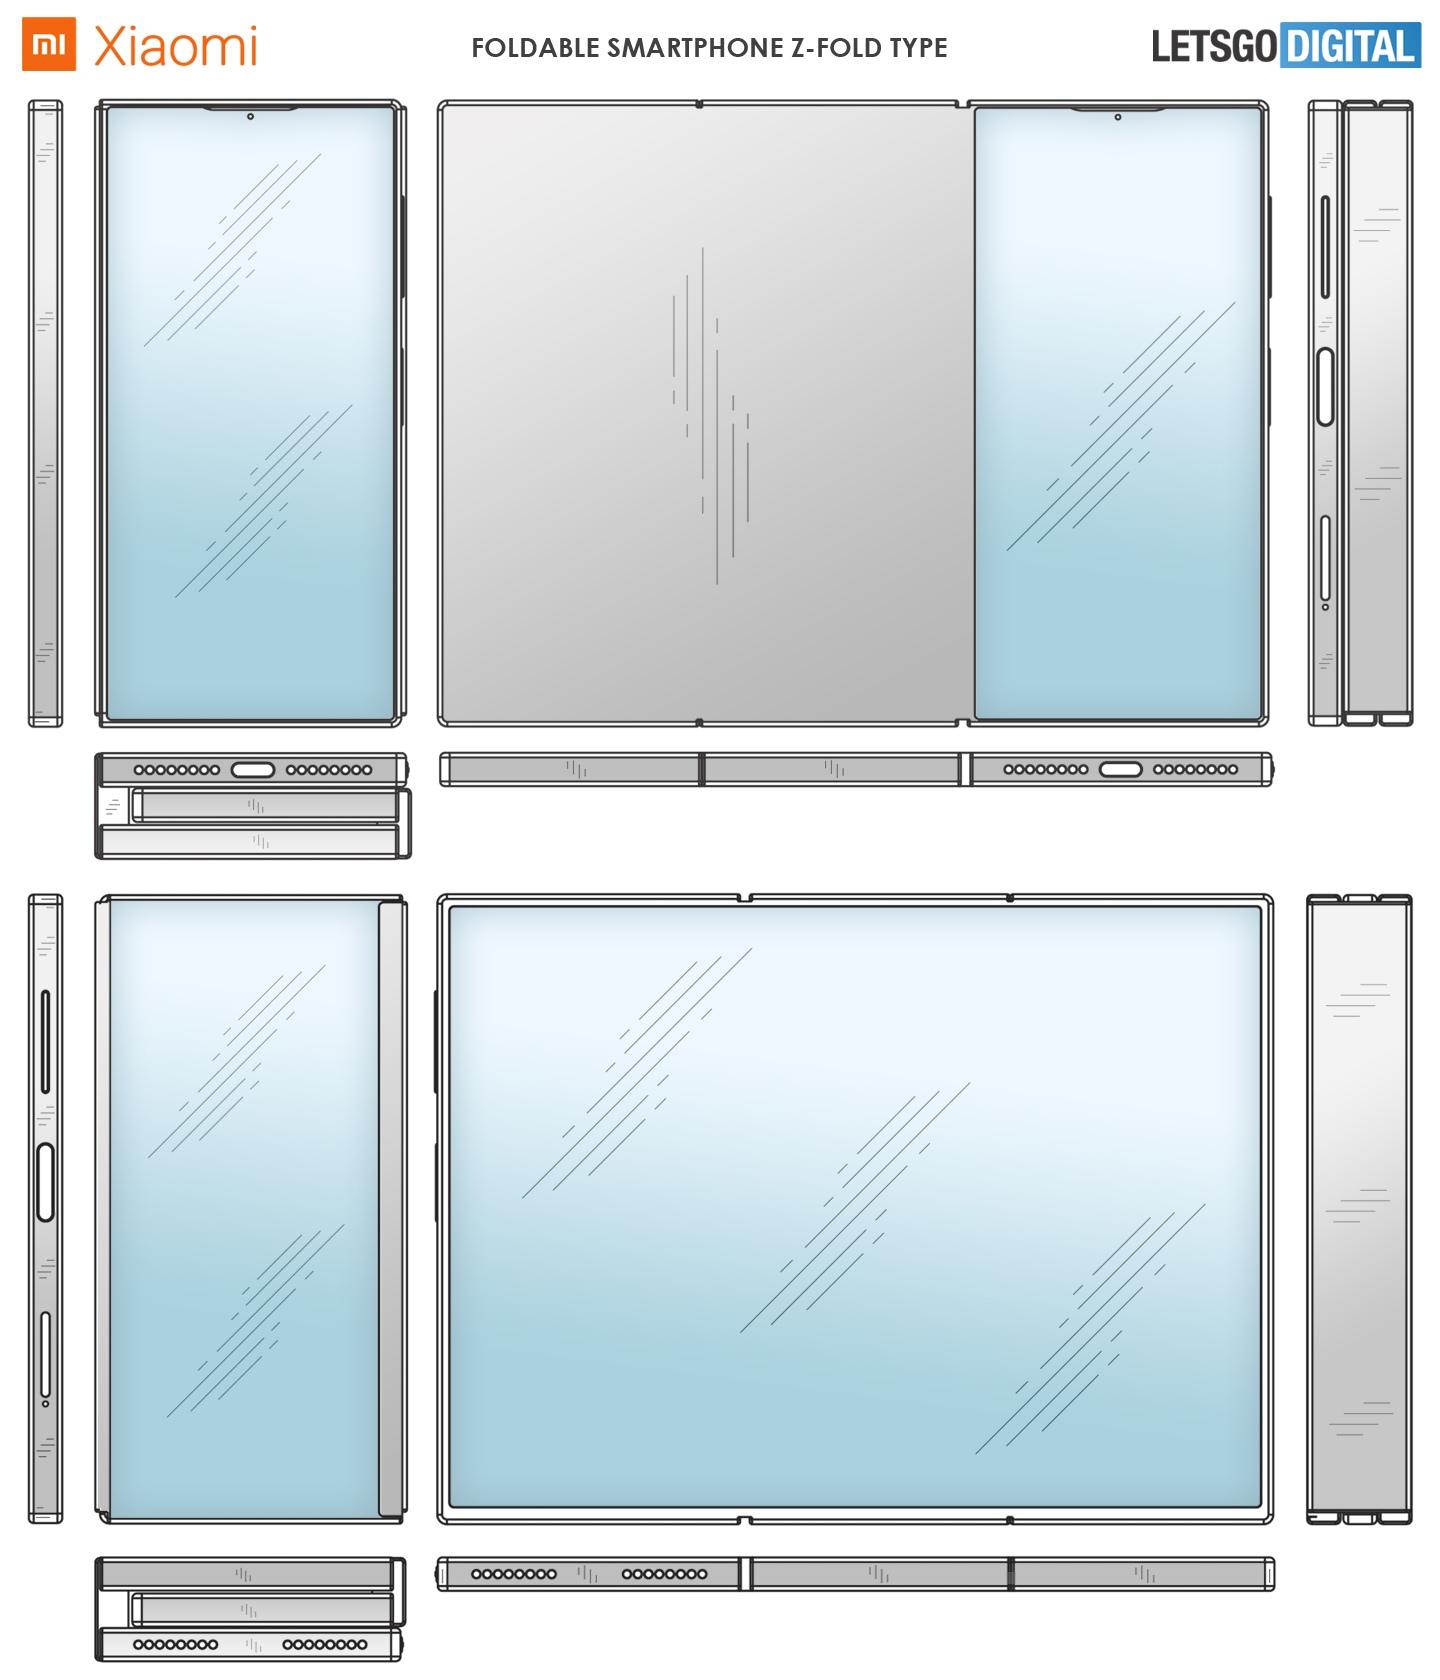 xiaomi foldable phone patent z shape